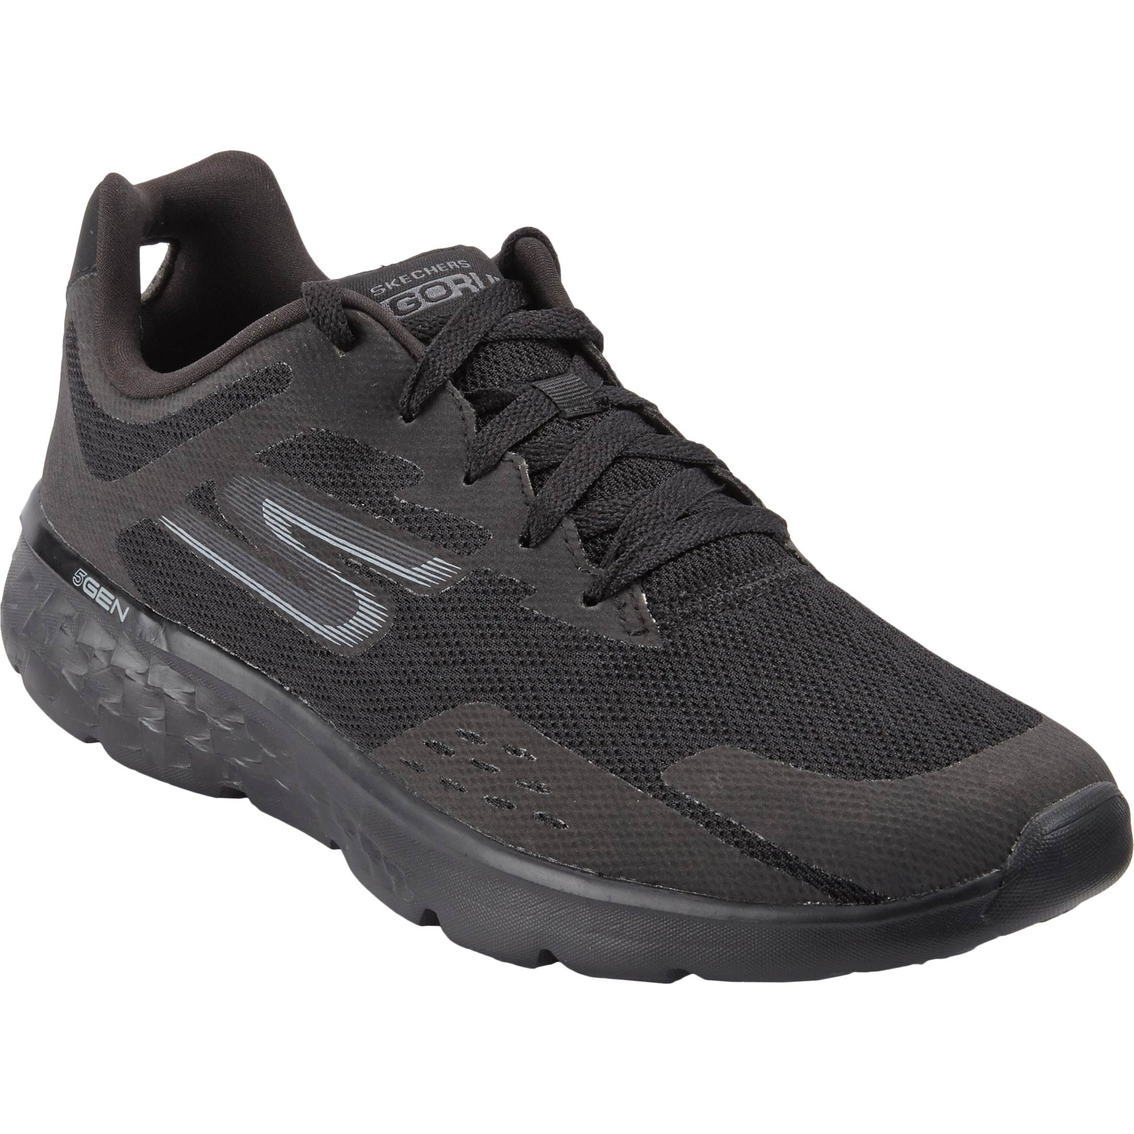 9281959602dd Skechers Men s Gorun 400 Disperse Training Shoes